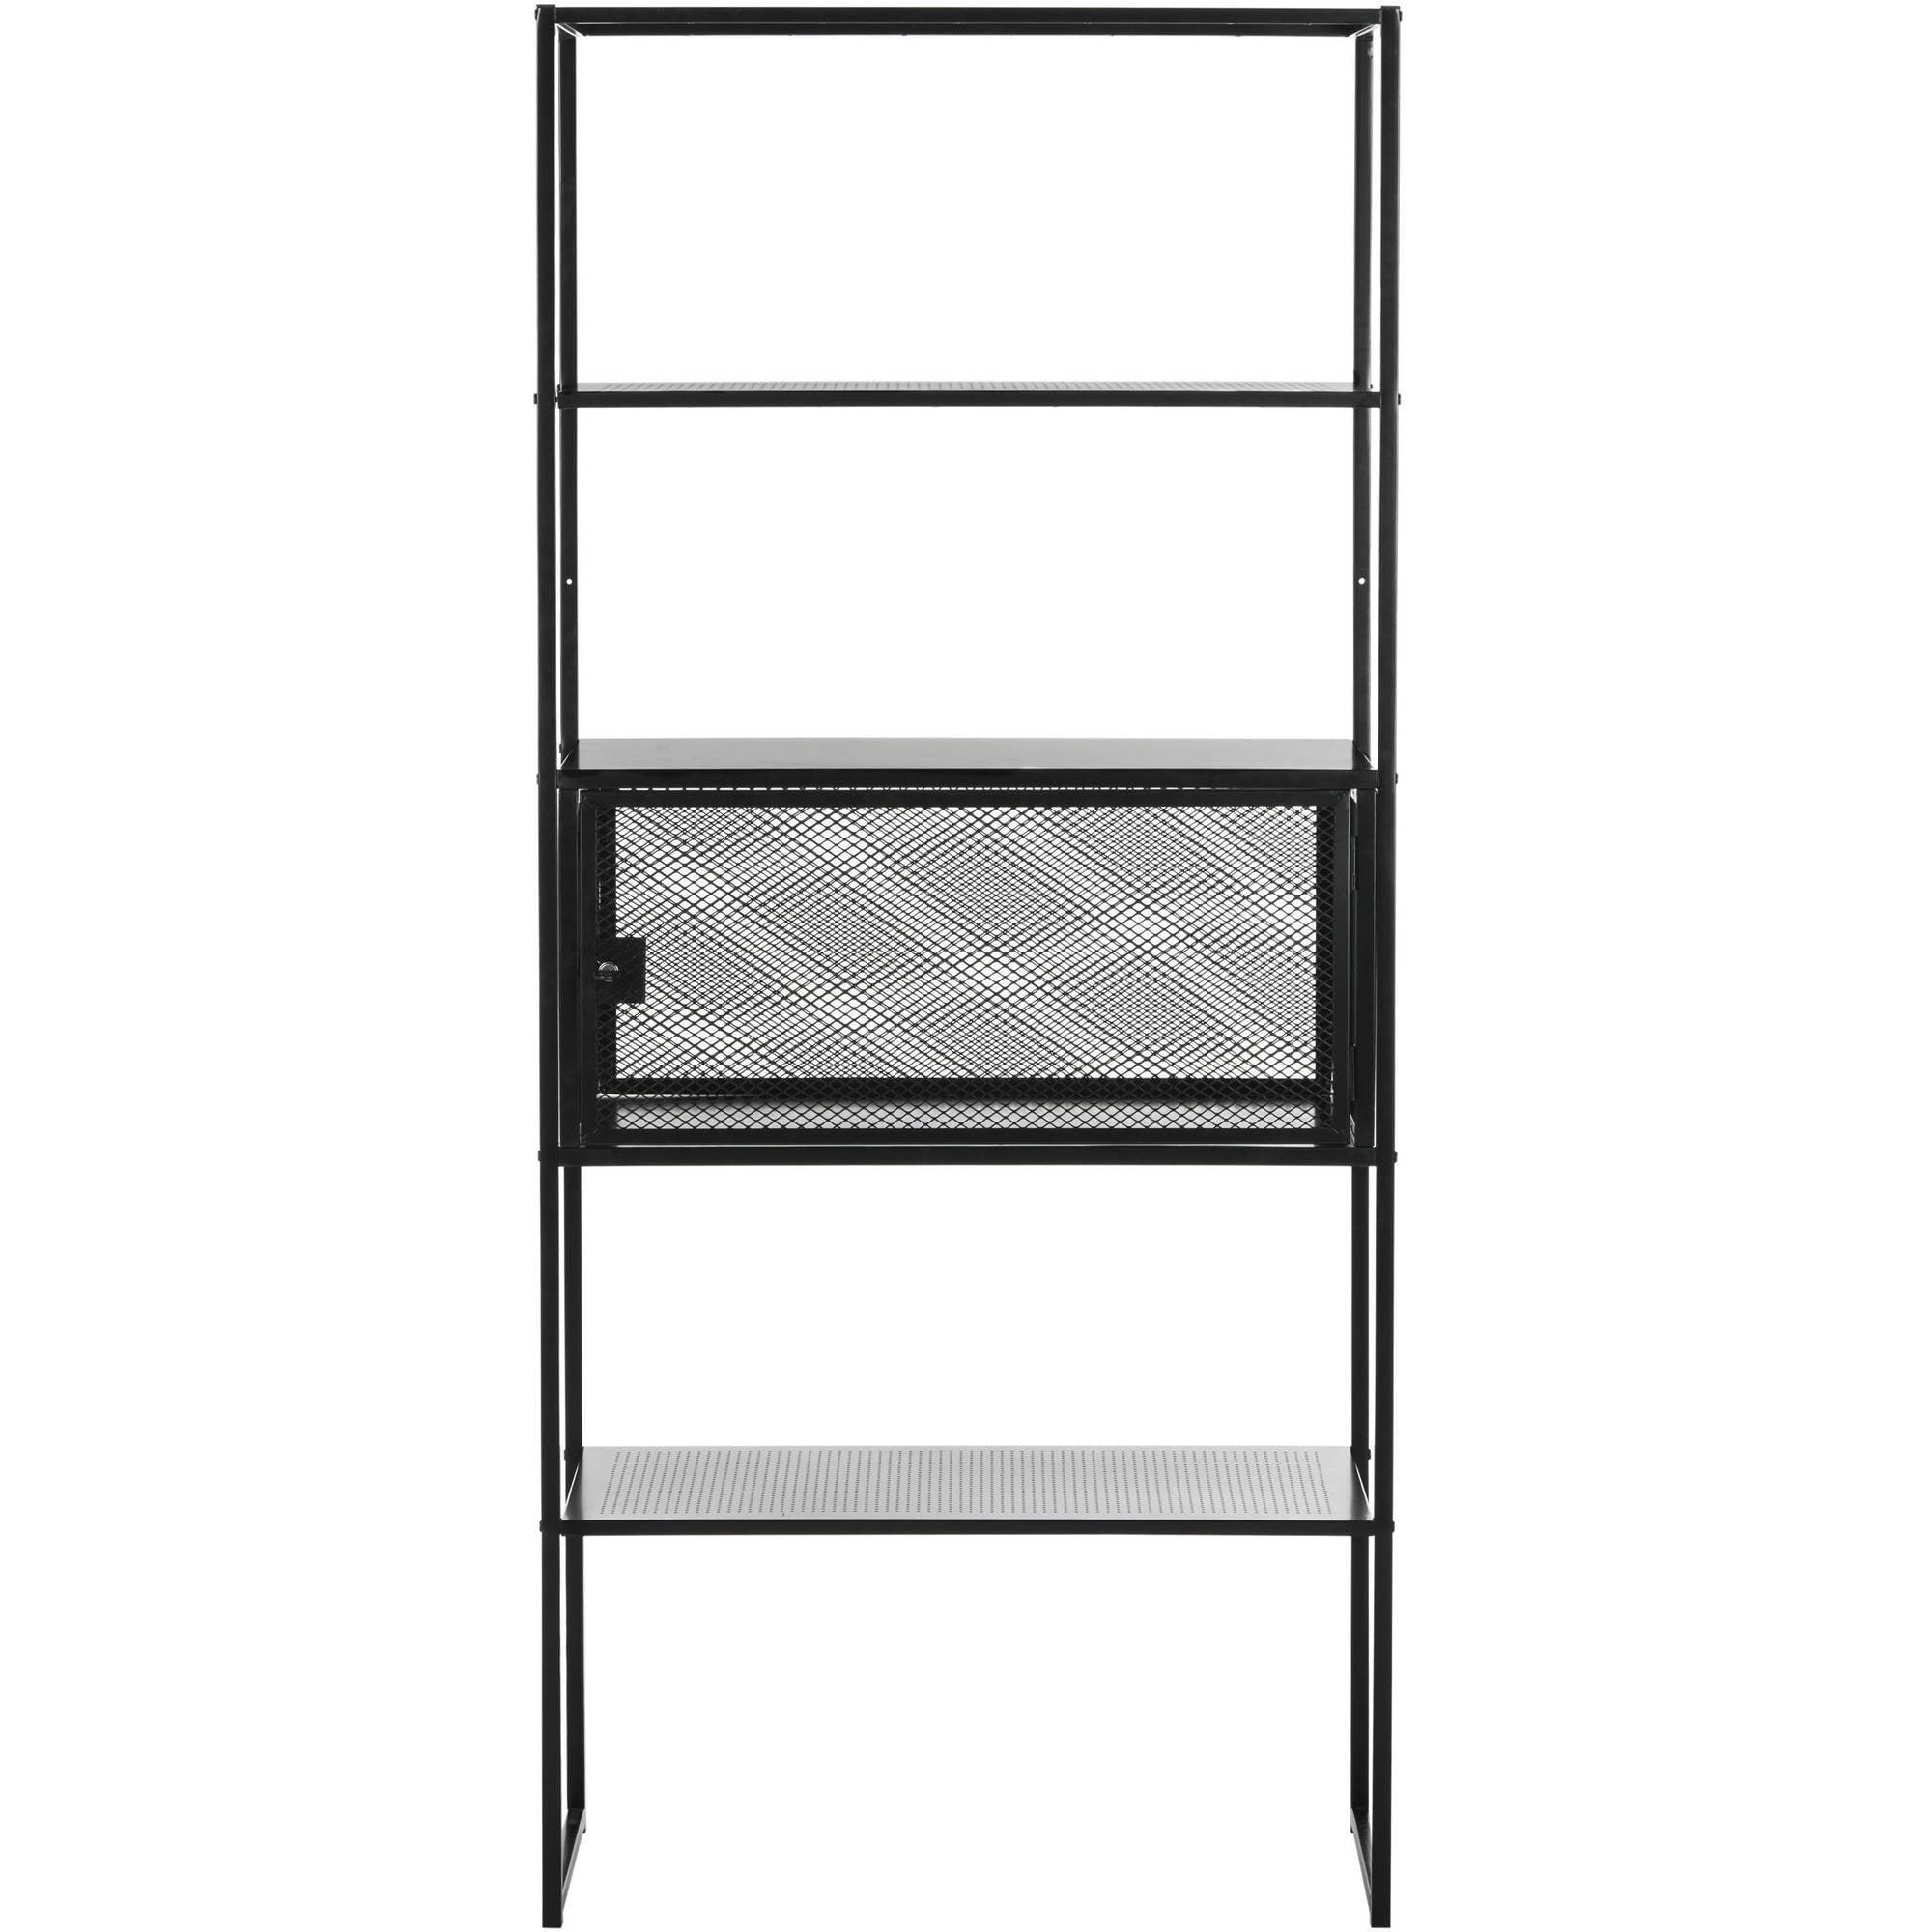 "Safavieh Abay 70"" Storage Bookshelf, Black by Safavieh"